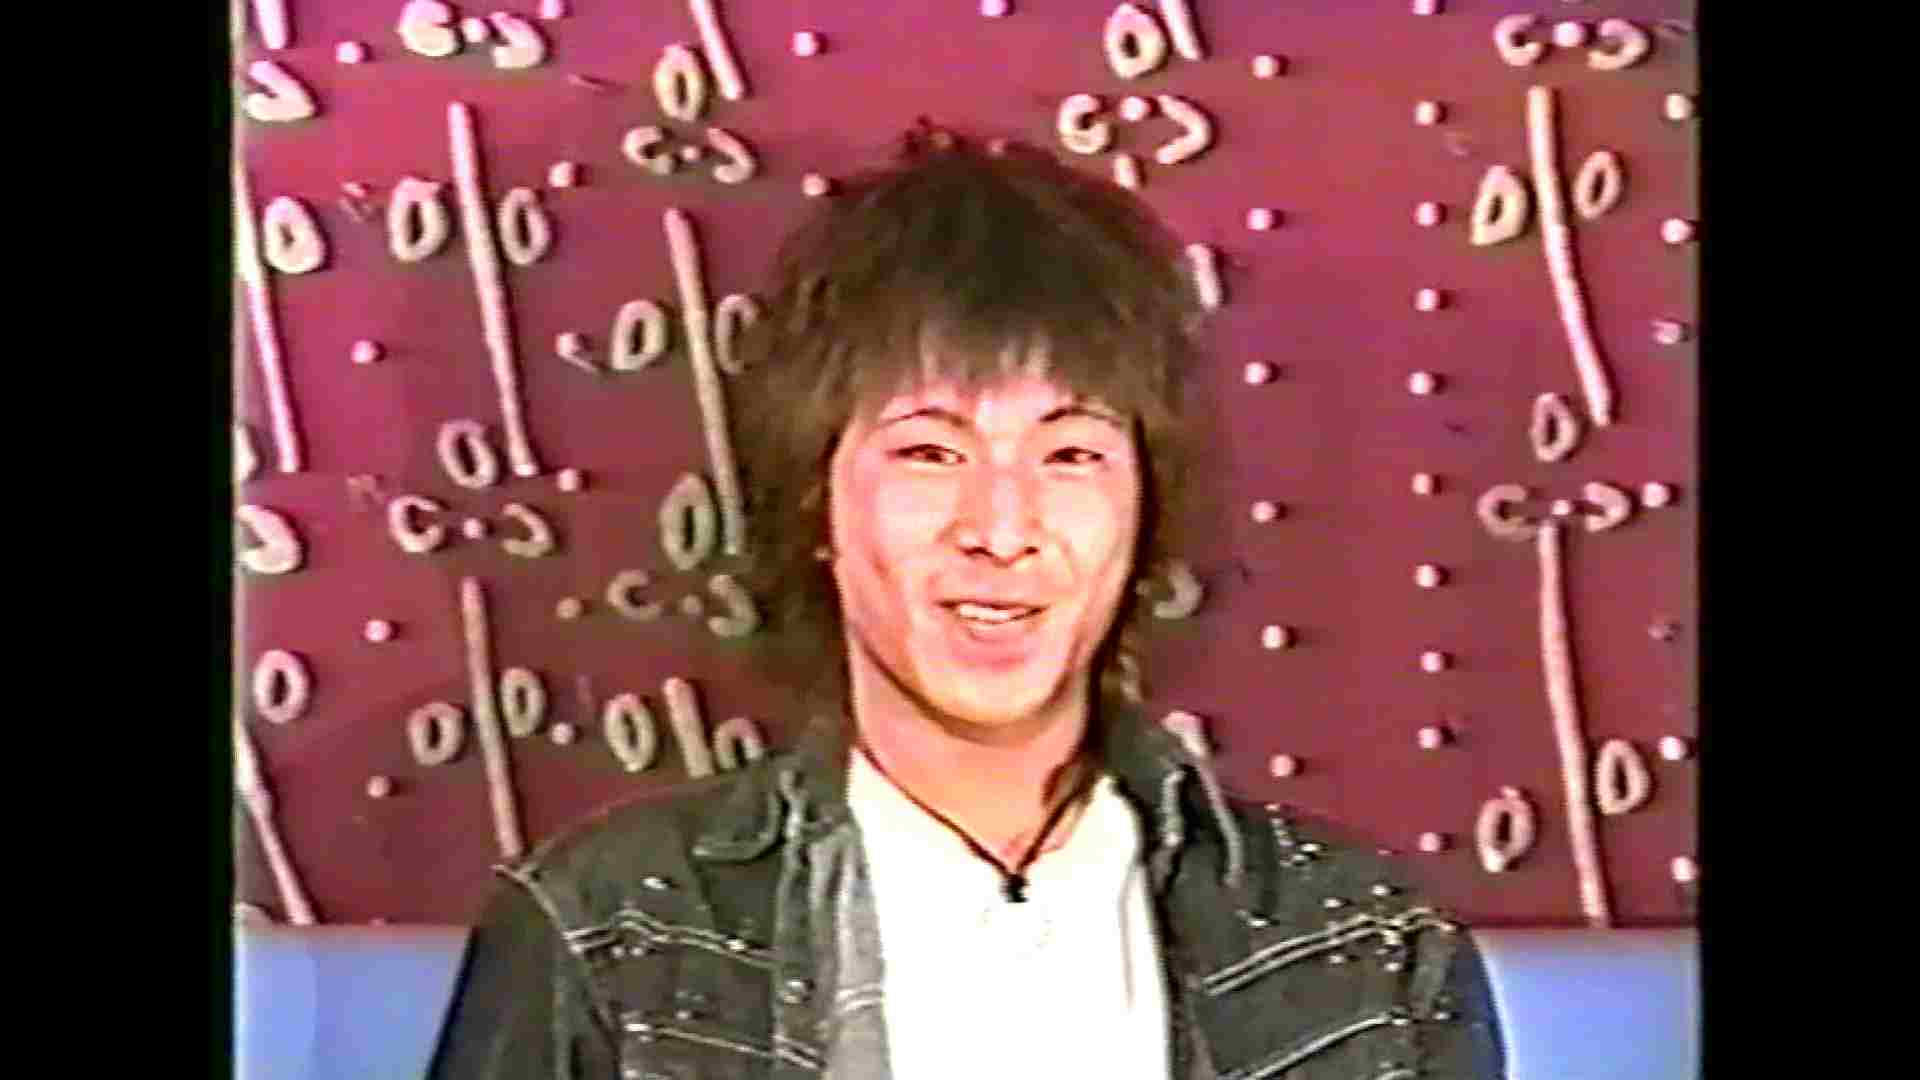 MADOKAさんのズリネタコレクションVol.3-1 名作・話題作 | オムニバス  101pic 25